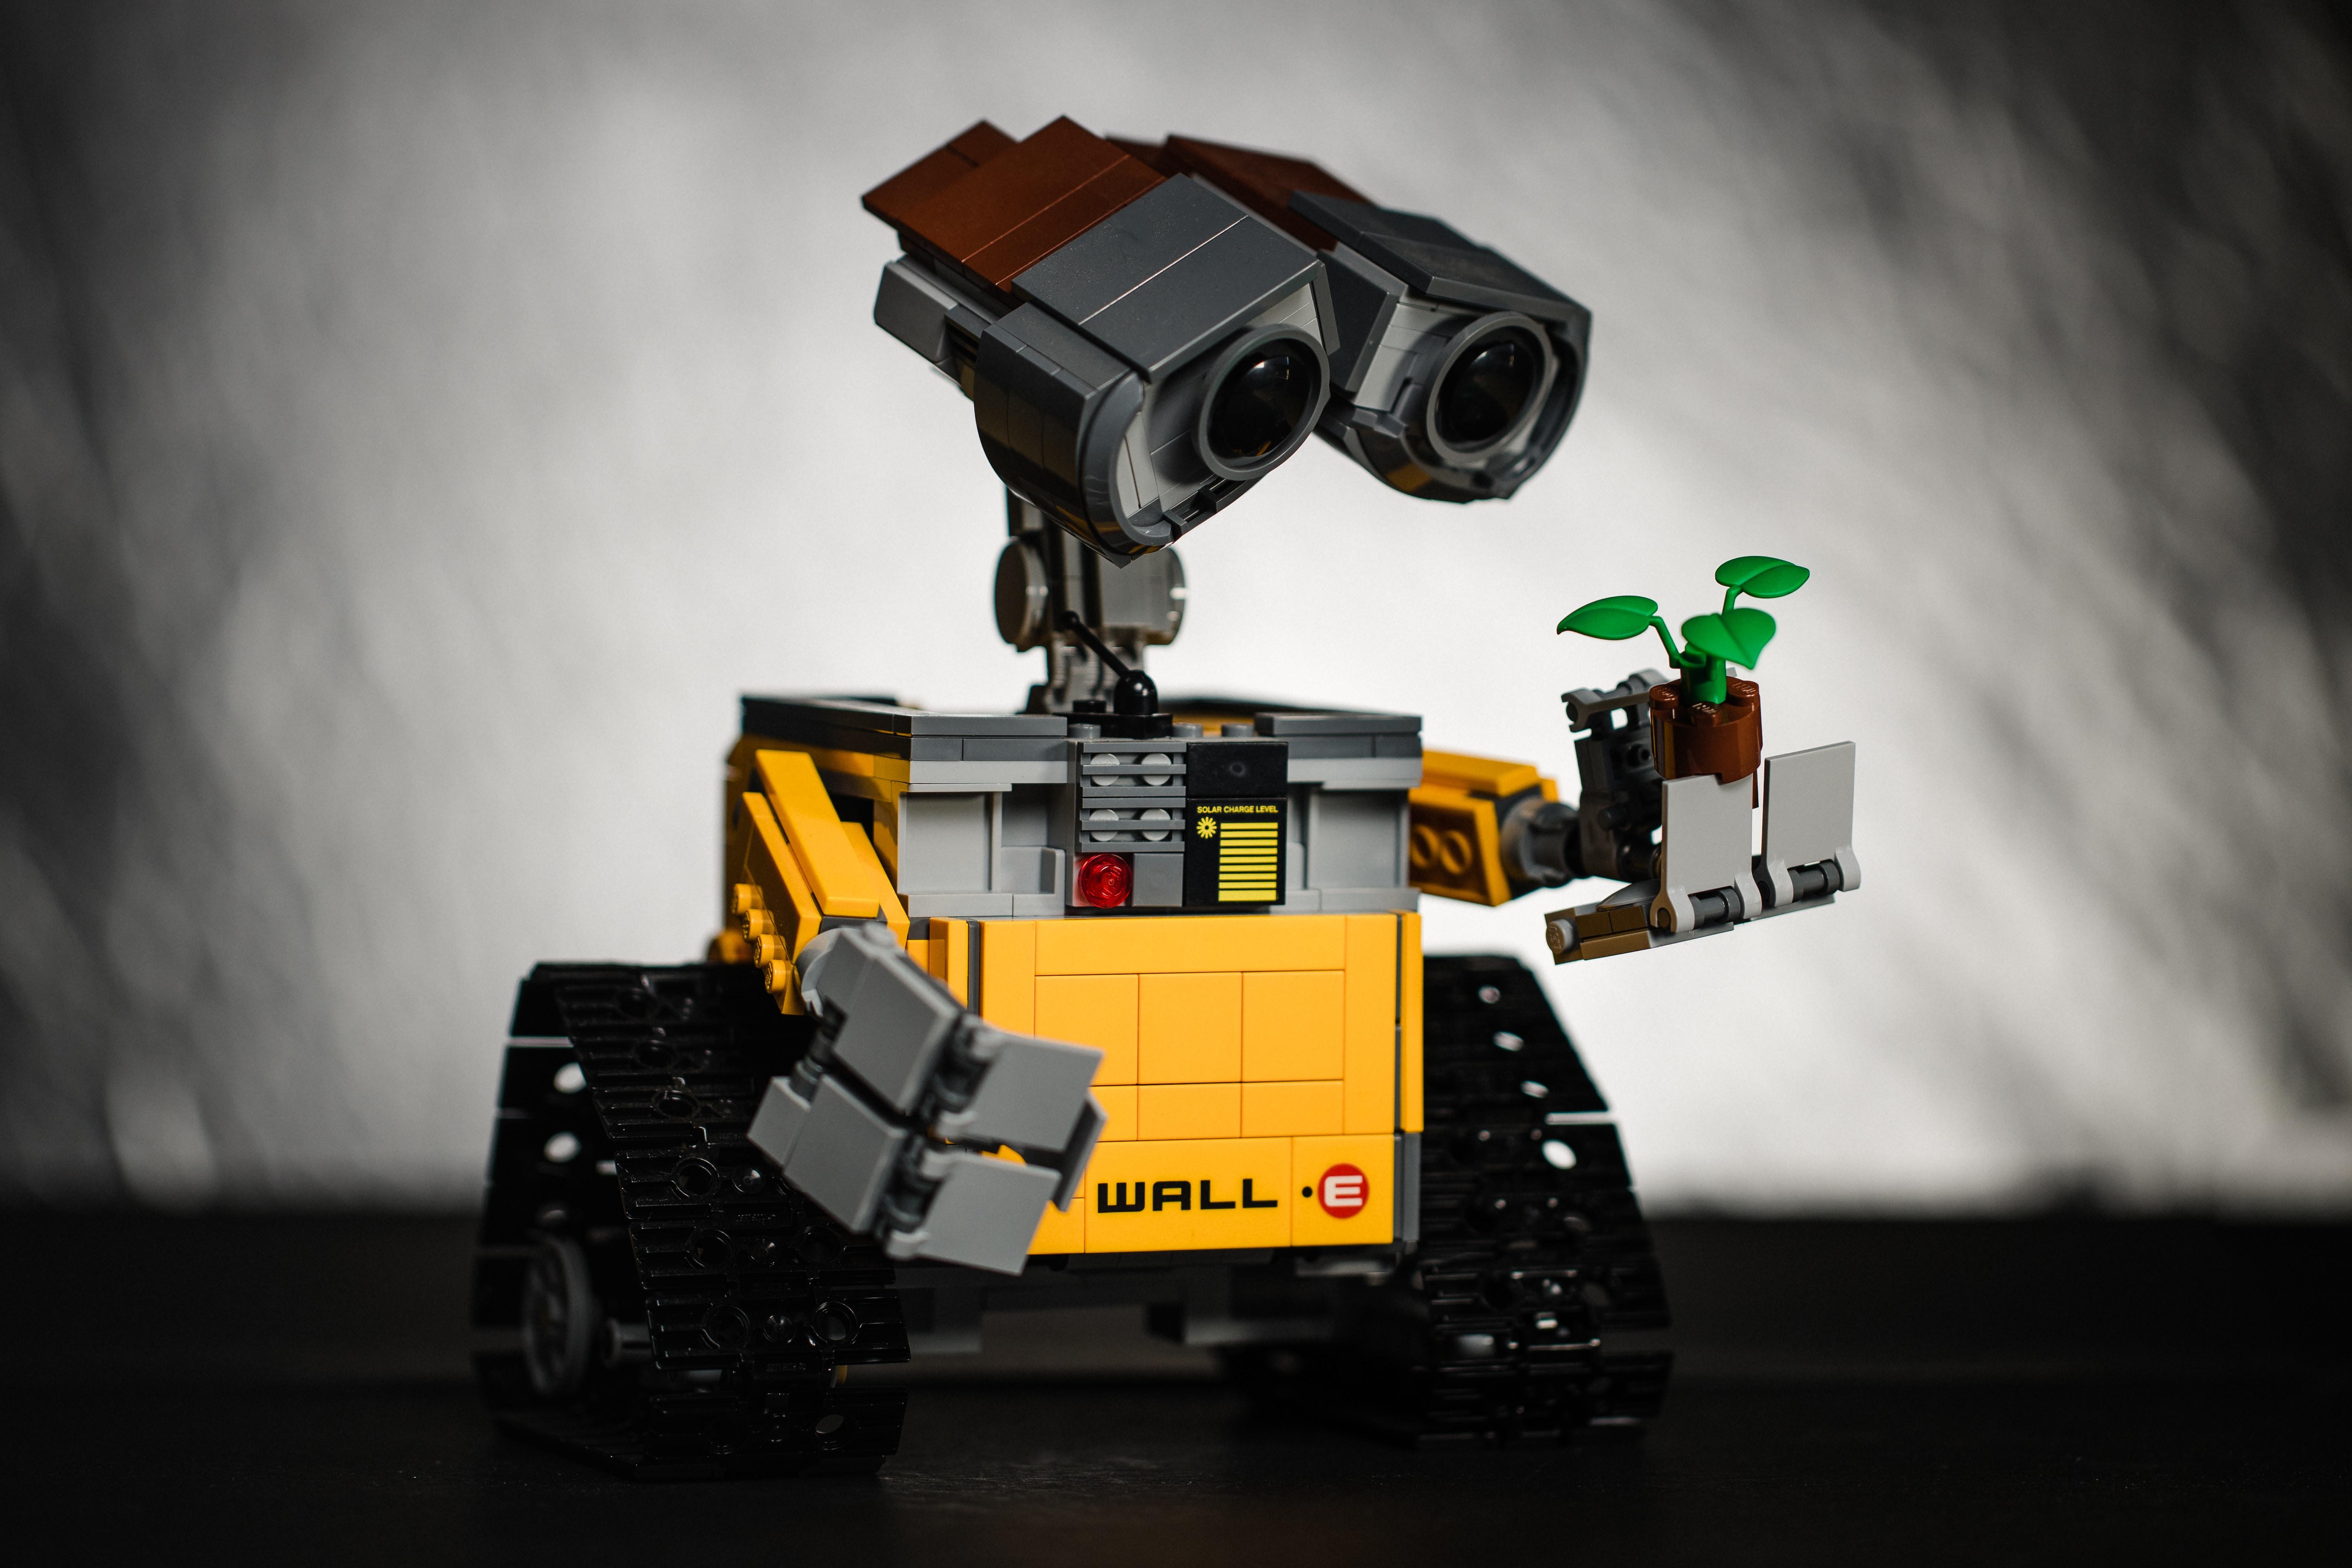 DHL Adding Robots to Warehouses